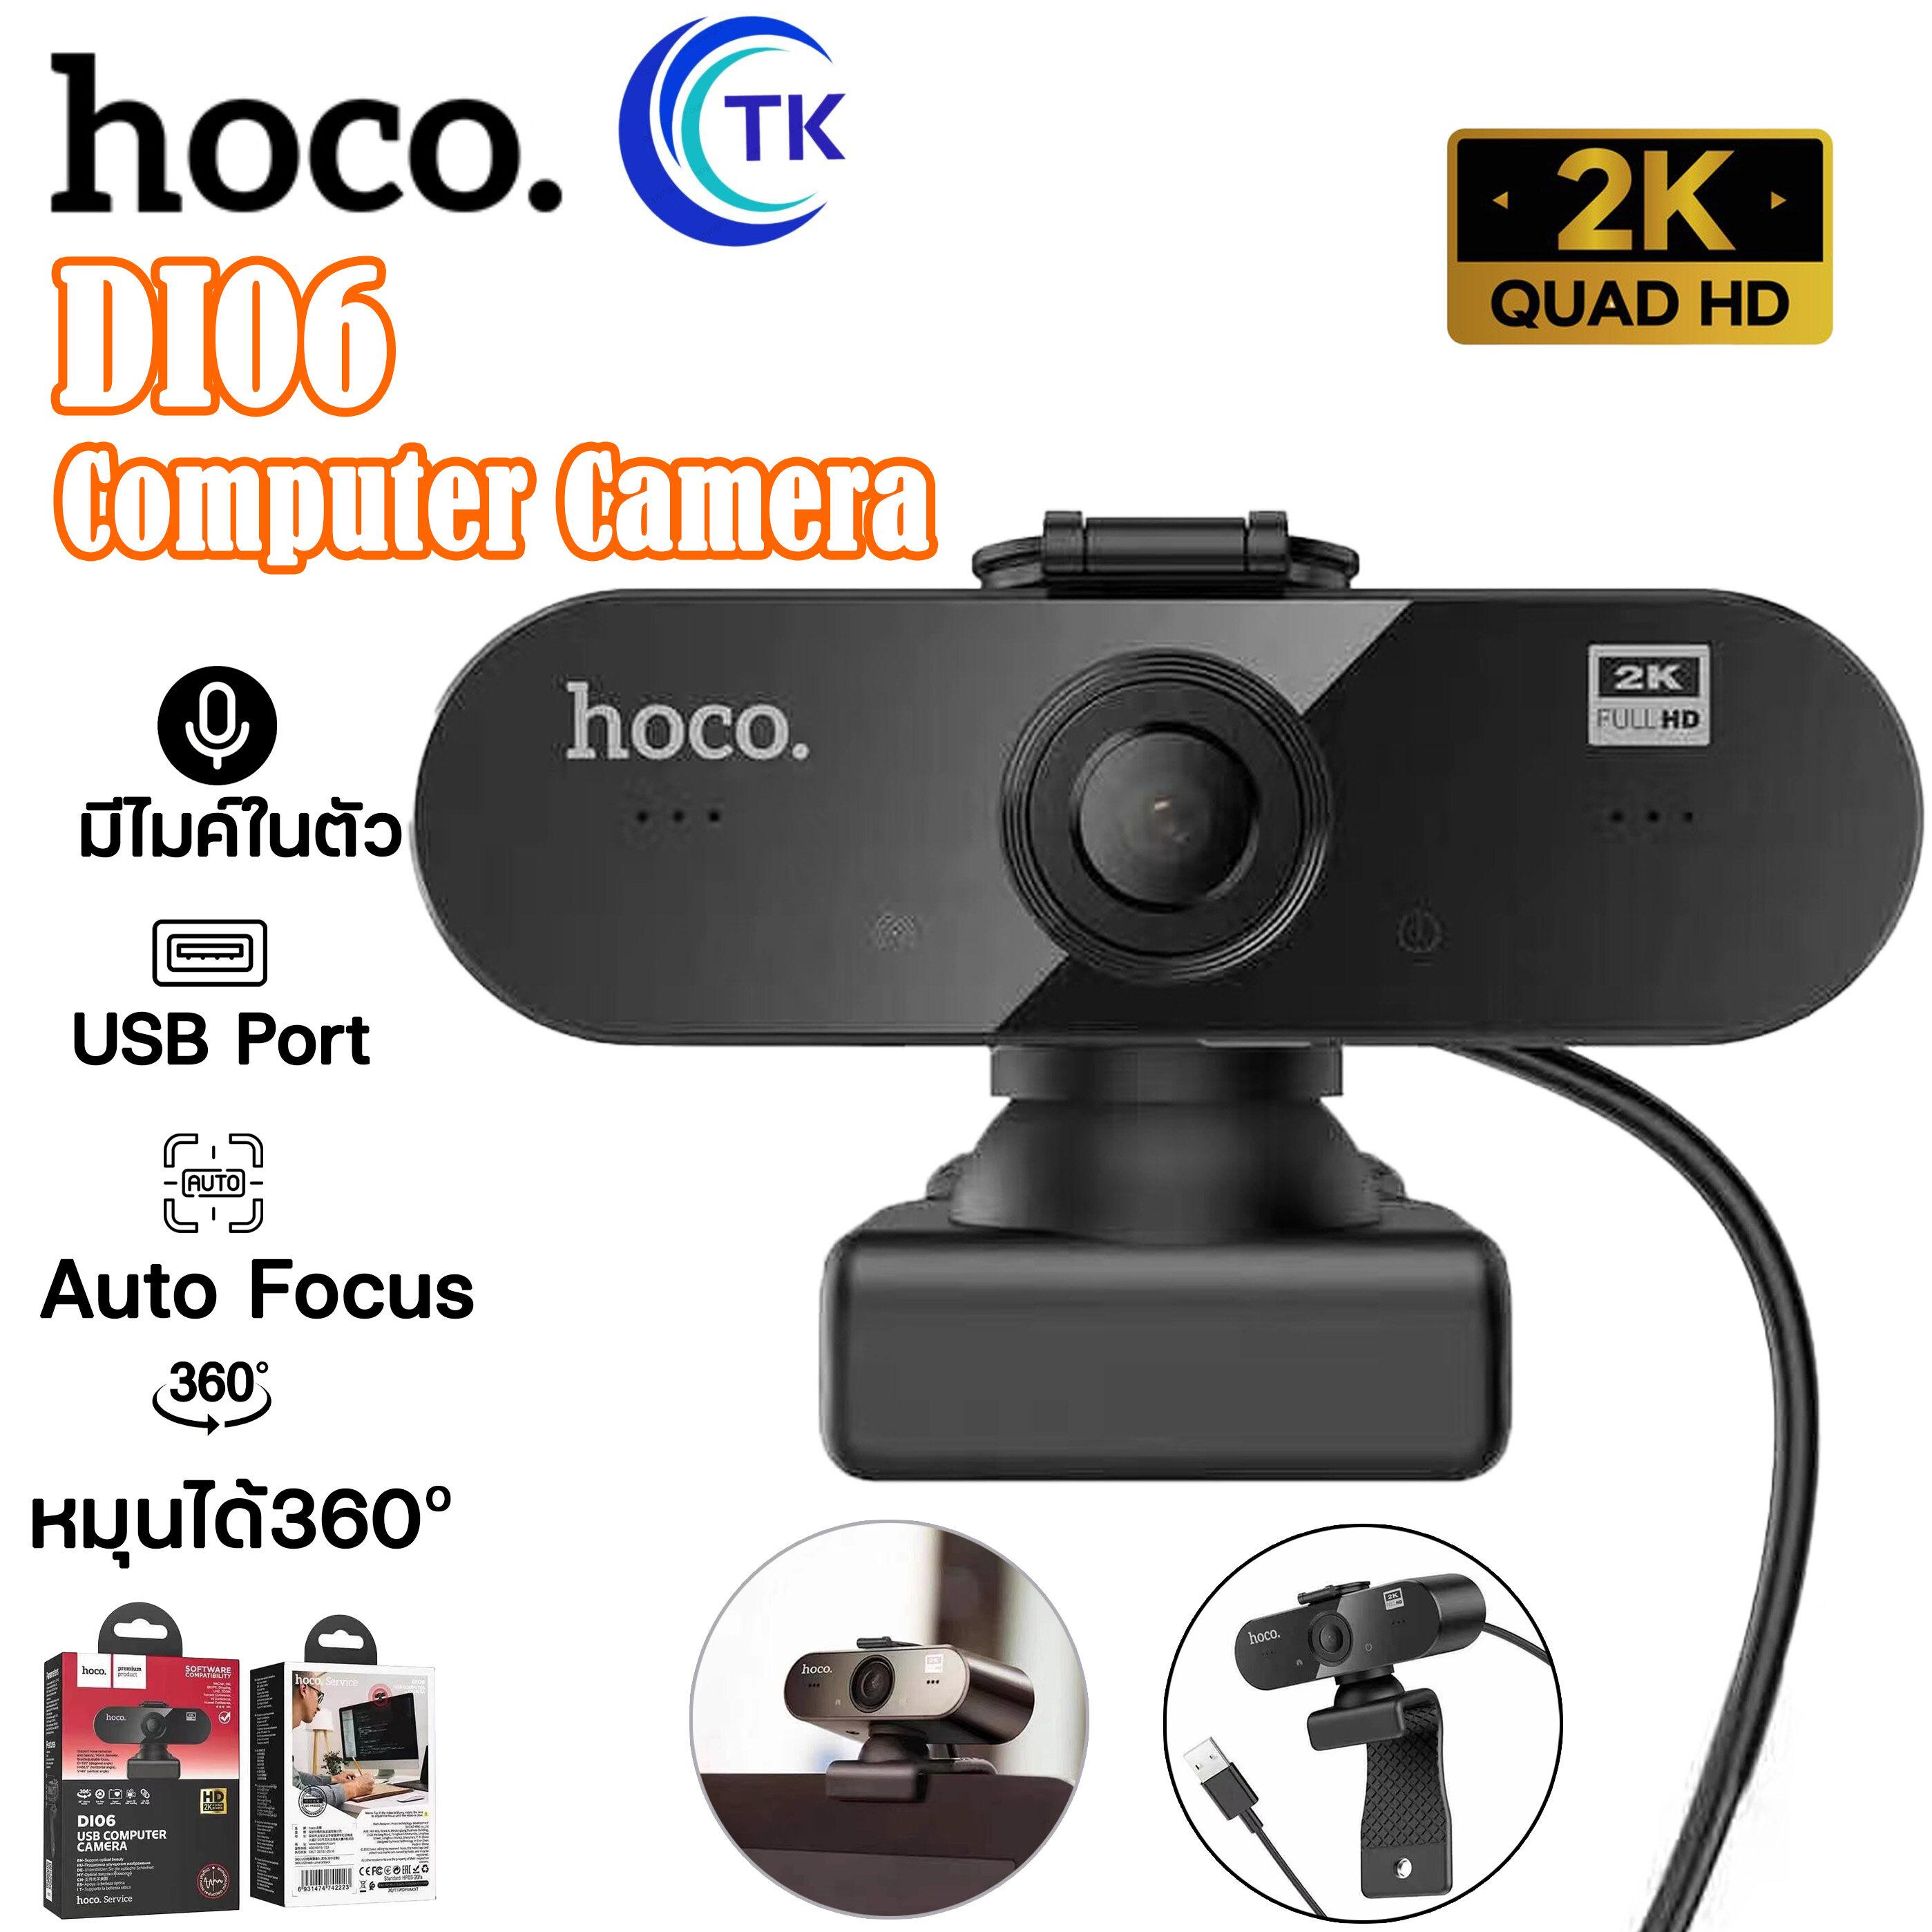 Hoco Di01 Di06 Web Camera 1080p Webcam กล้องเว็บแคม ความละเอียด 1080p และ 2k.